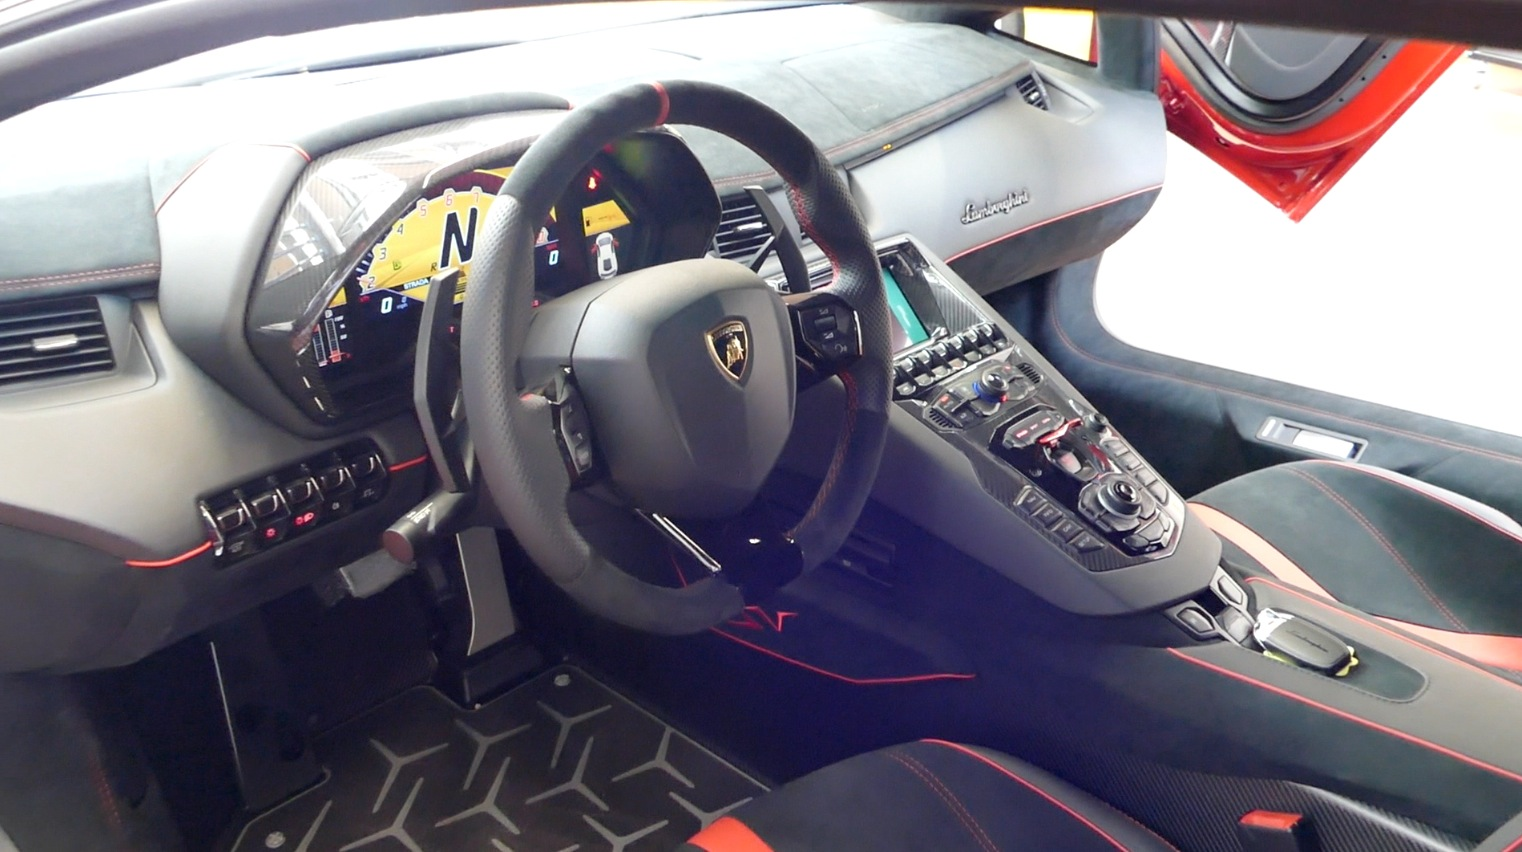 LamborghiniAventador-LP750-4_autogefueh009